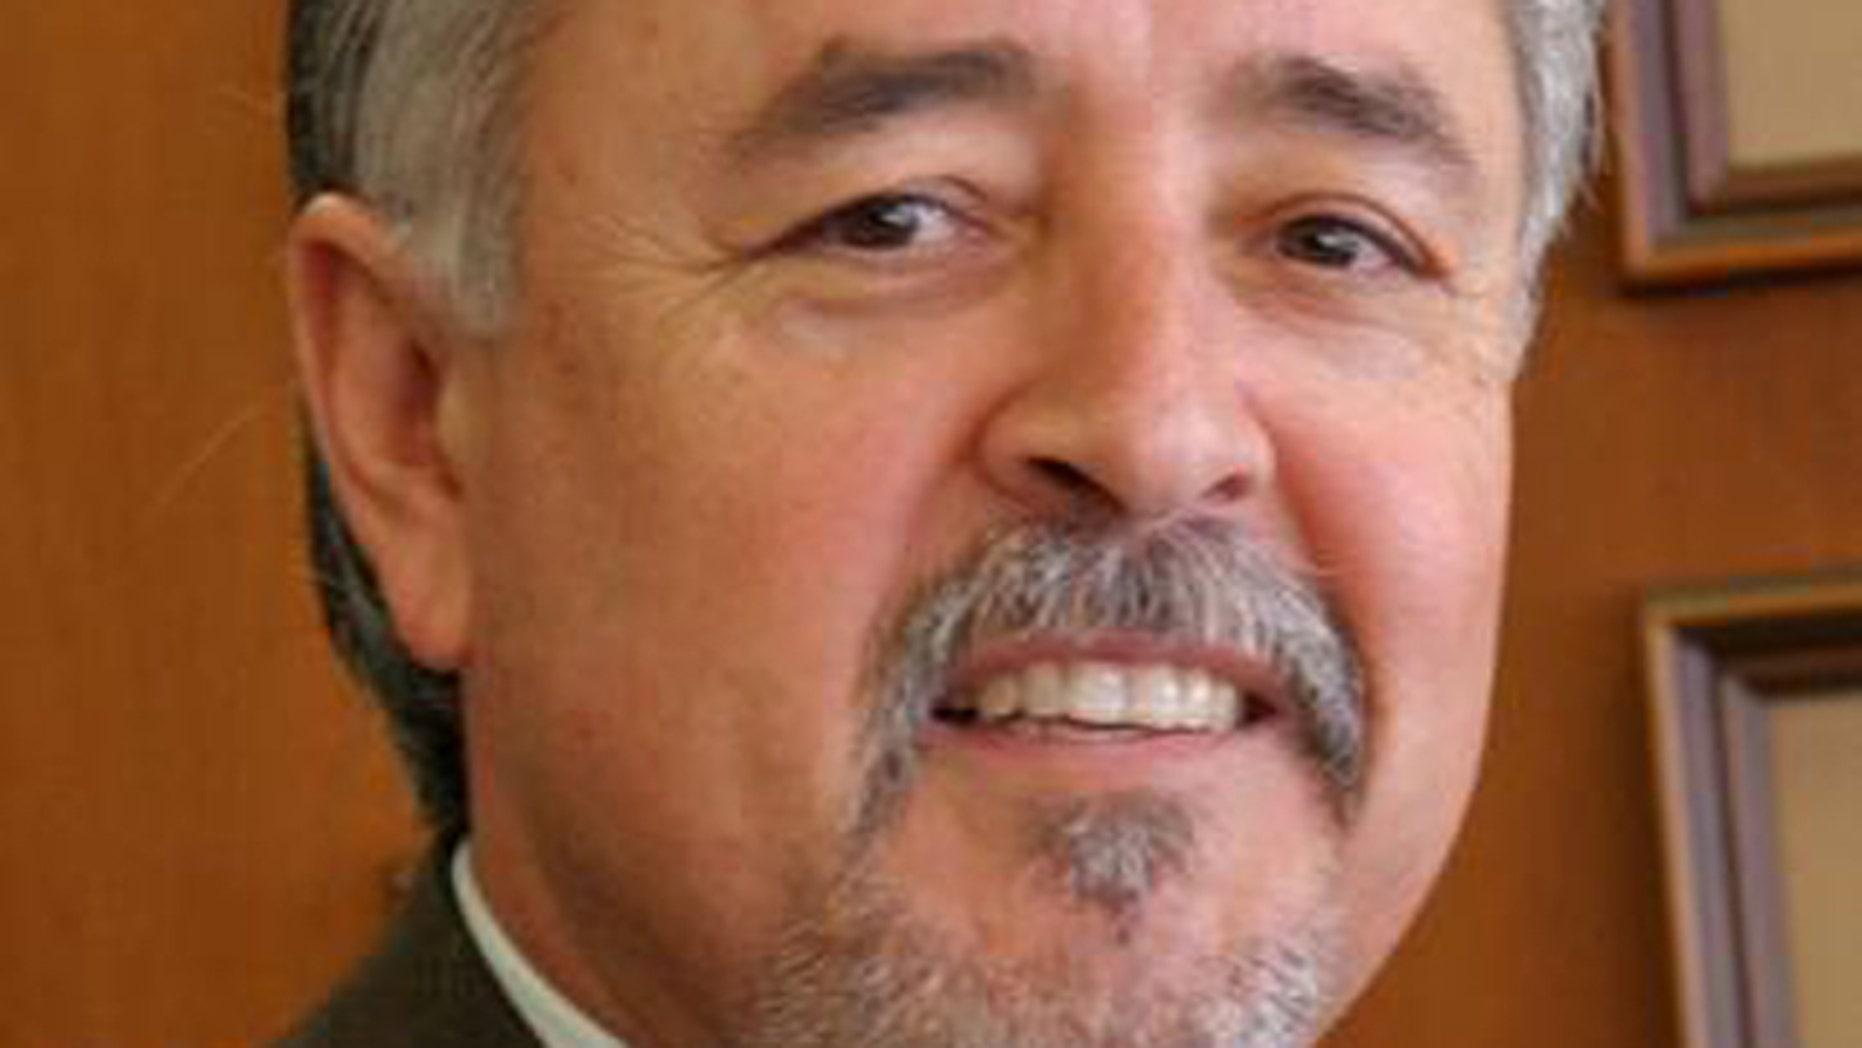 Los Angeles County Superior Court Judge Peter Espinoza